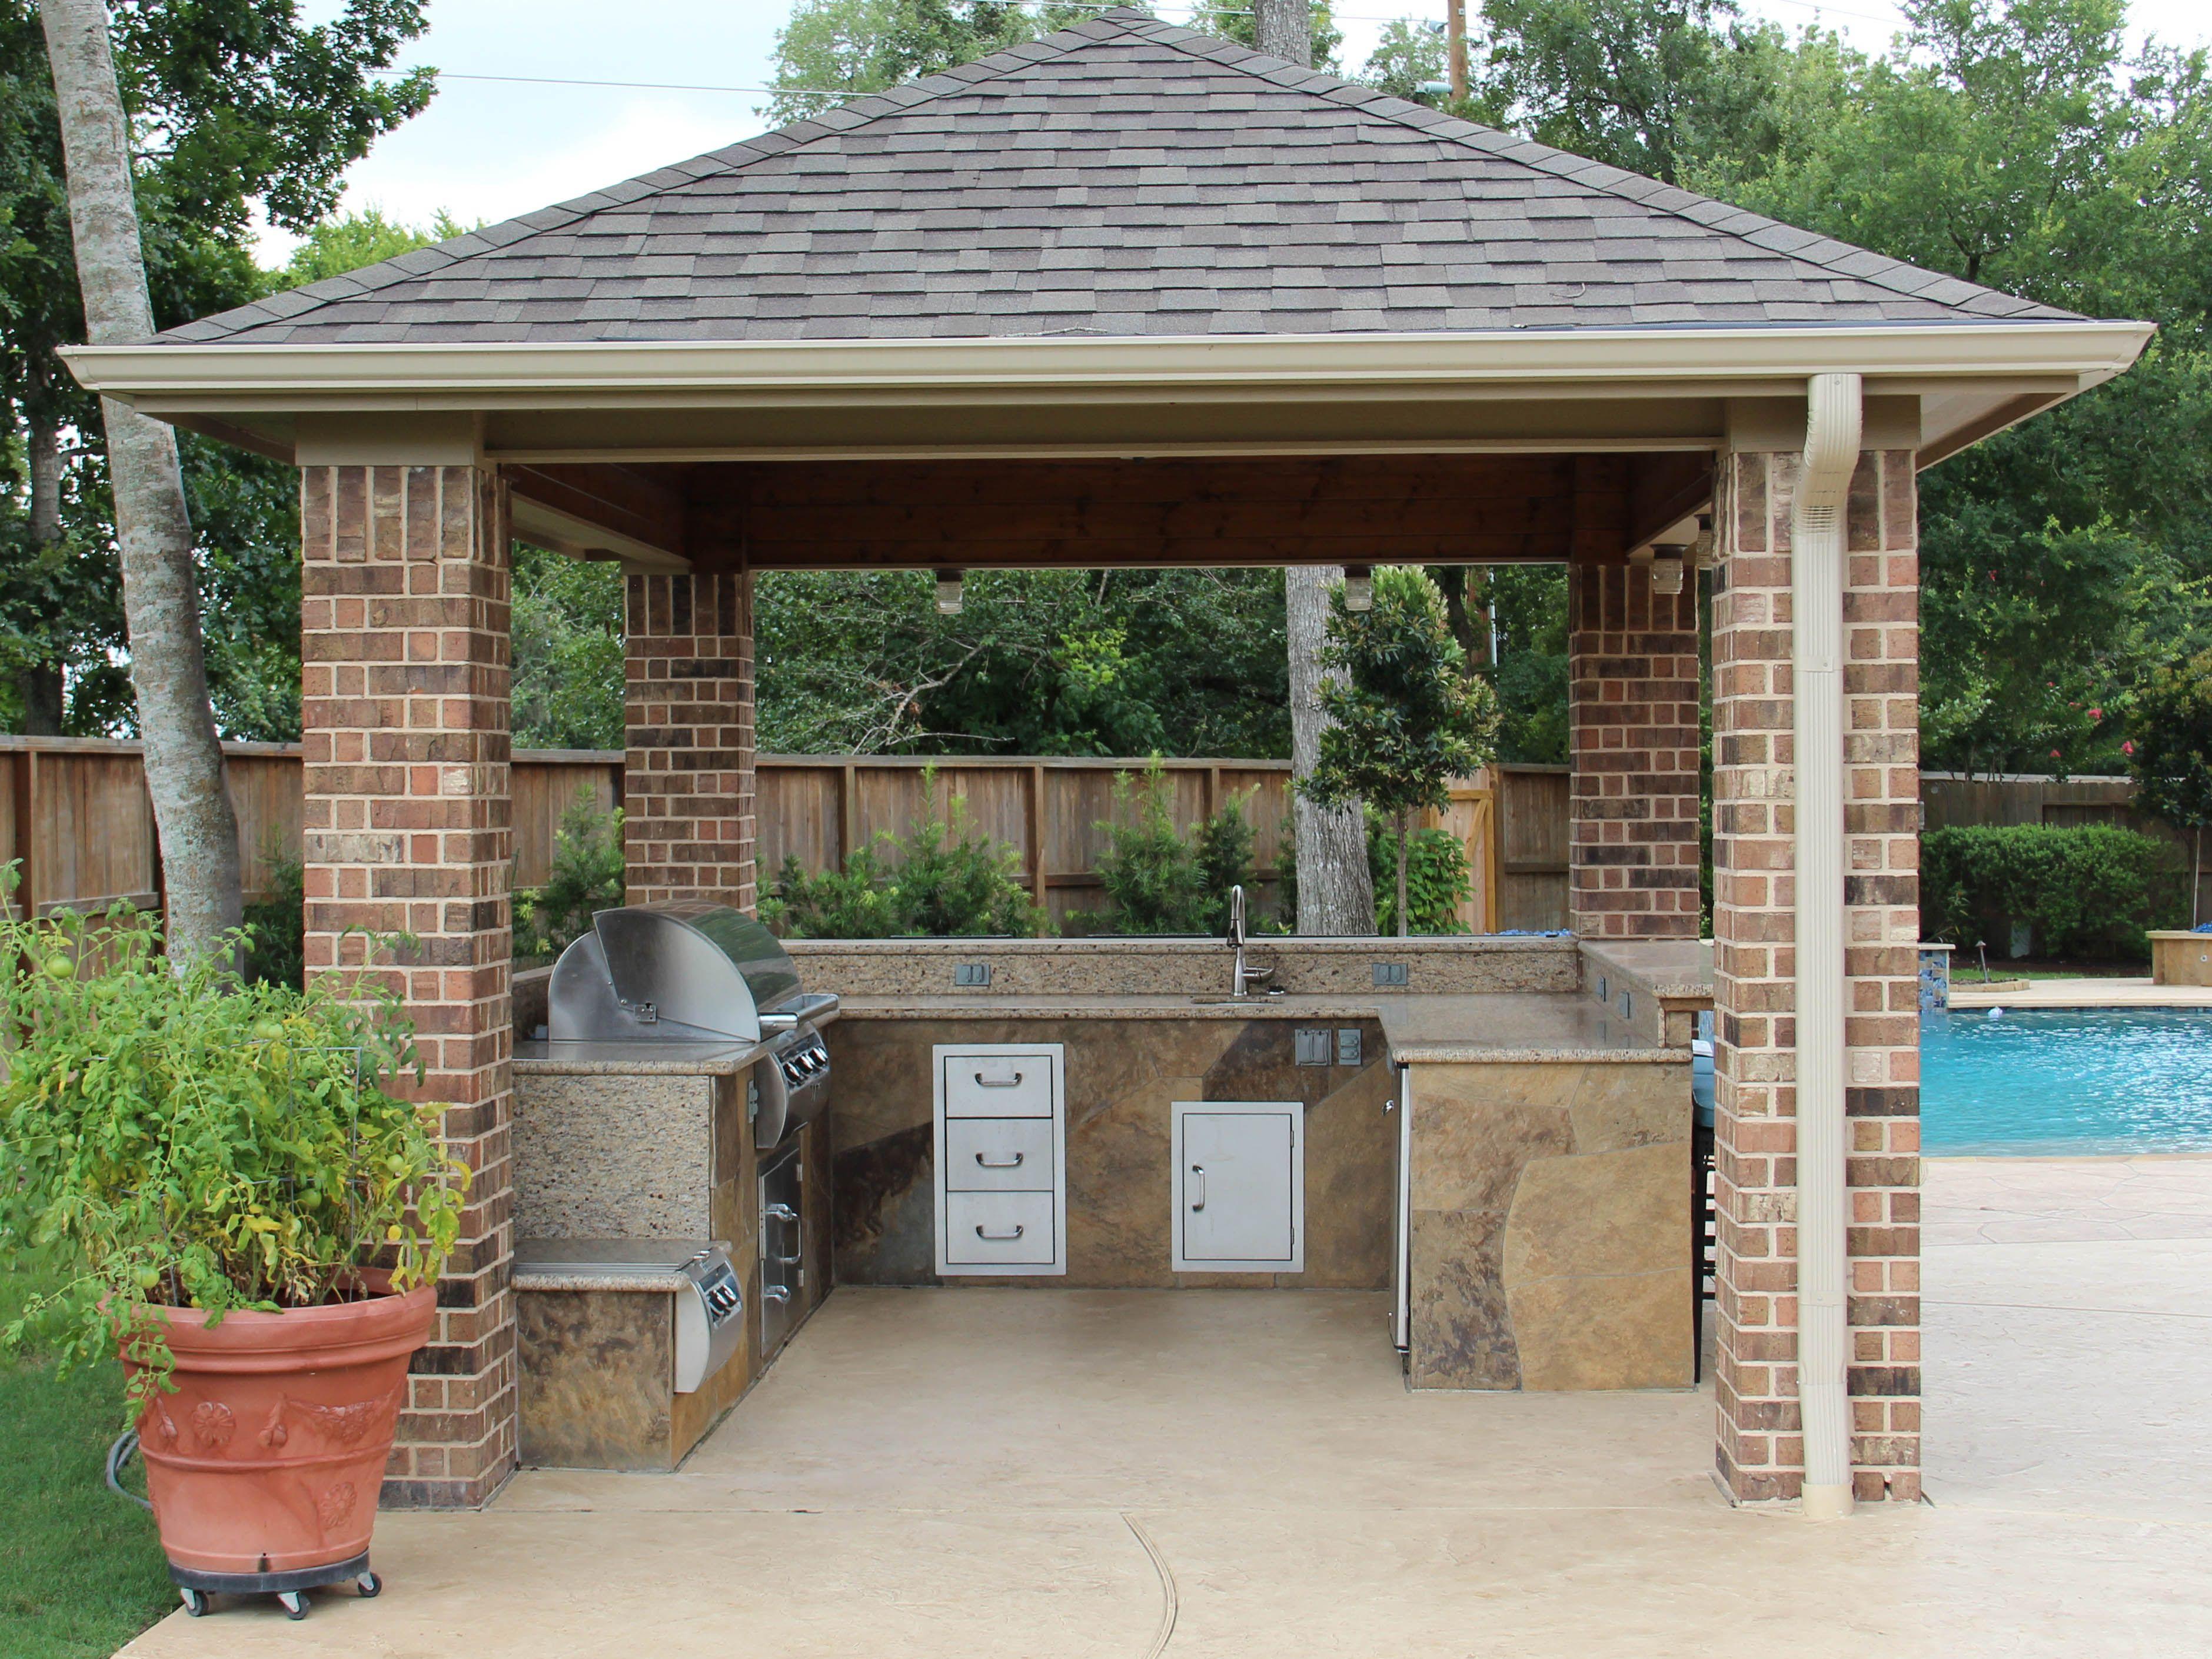 Www Customoutdoors Com Outdoor Kitchen Under A Texas Porch Style Patio Cover Kitchen Has A Grill Sink Refrigerat Porch Styles Outdoor Kitchen Covered Patio